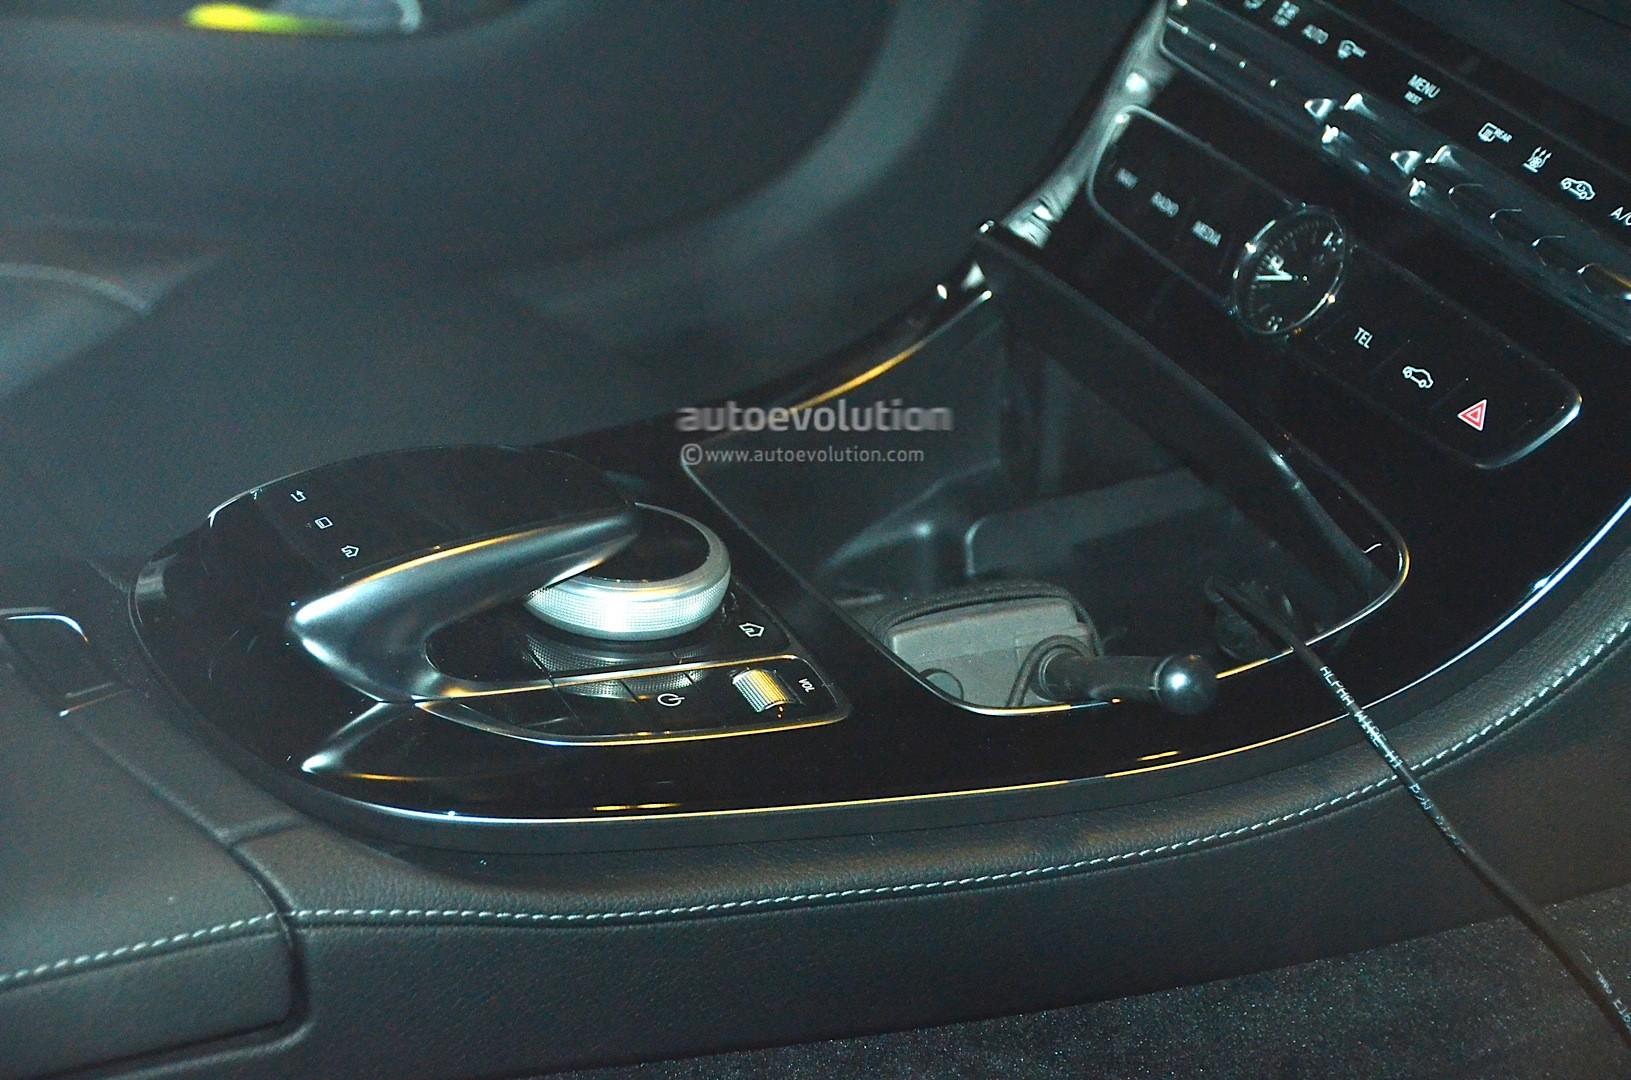 Spyshots 2017 mercedes benz e class interior fully for Mercedes benz e class interior